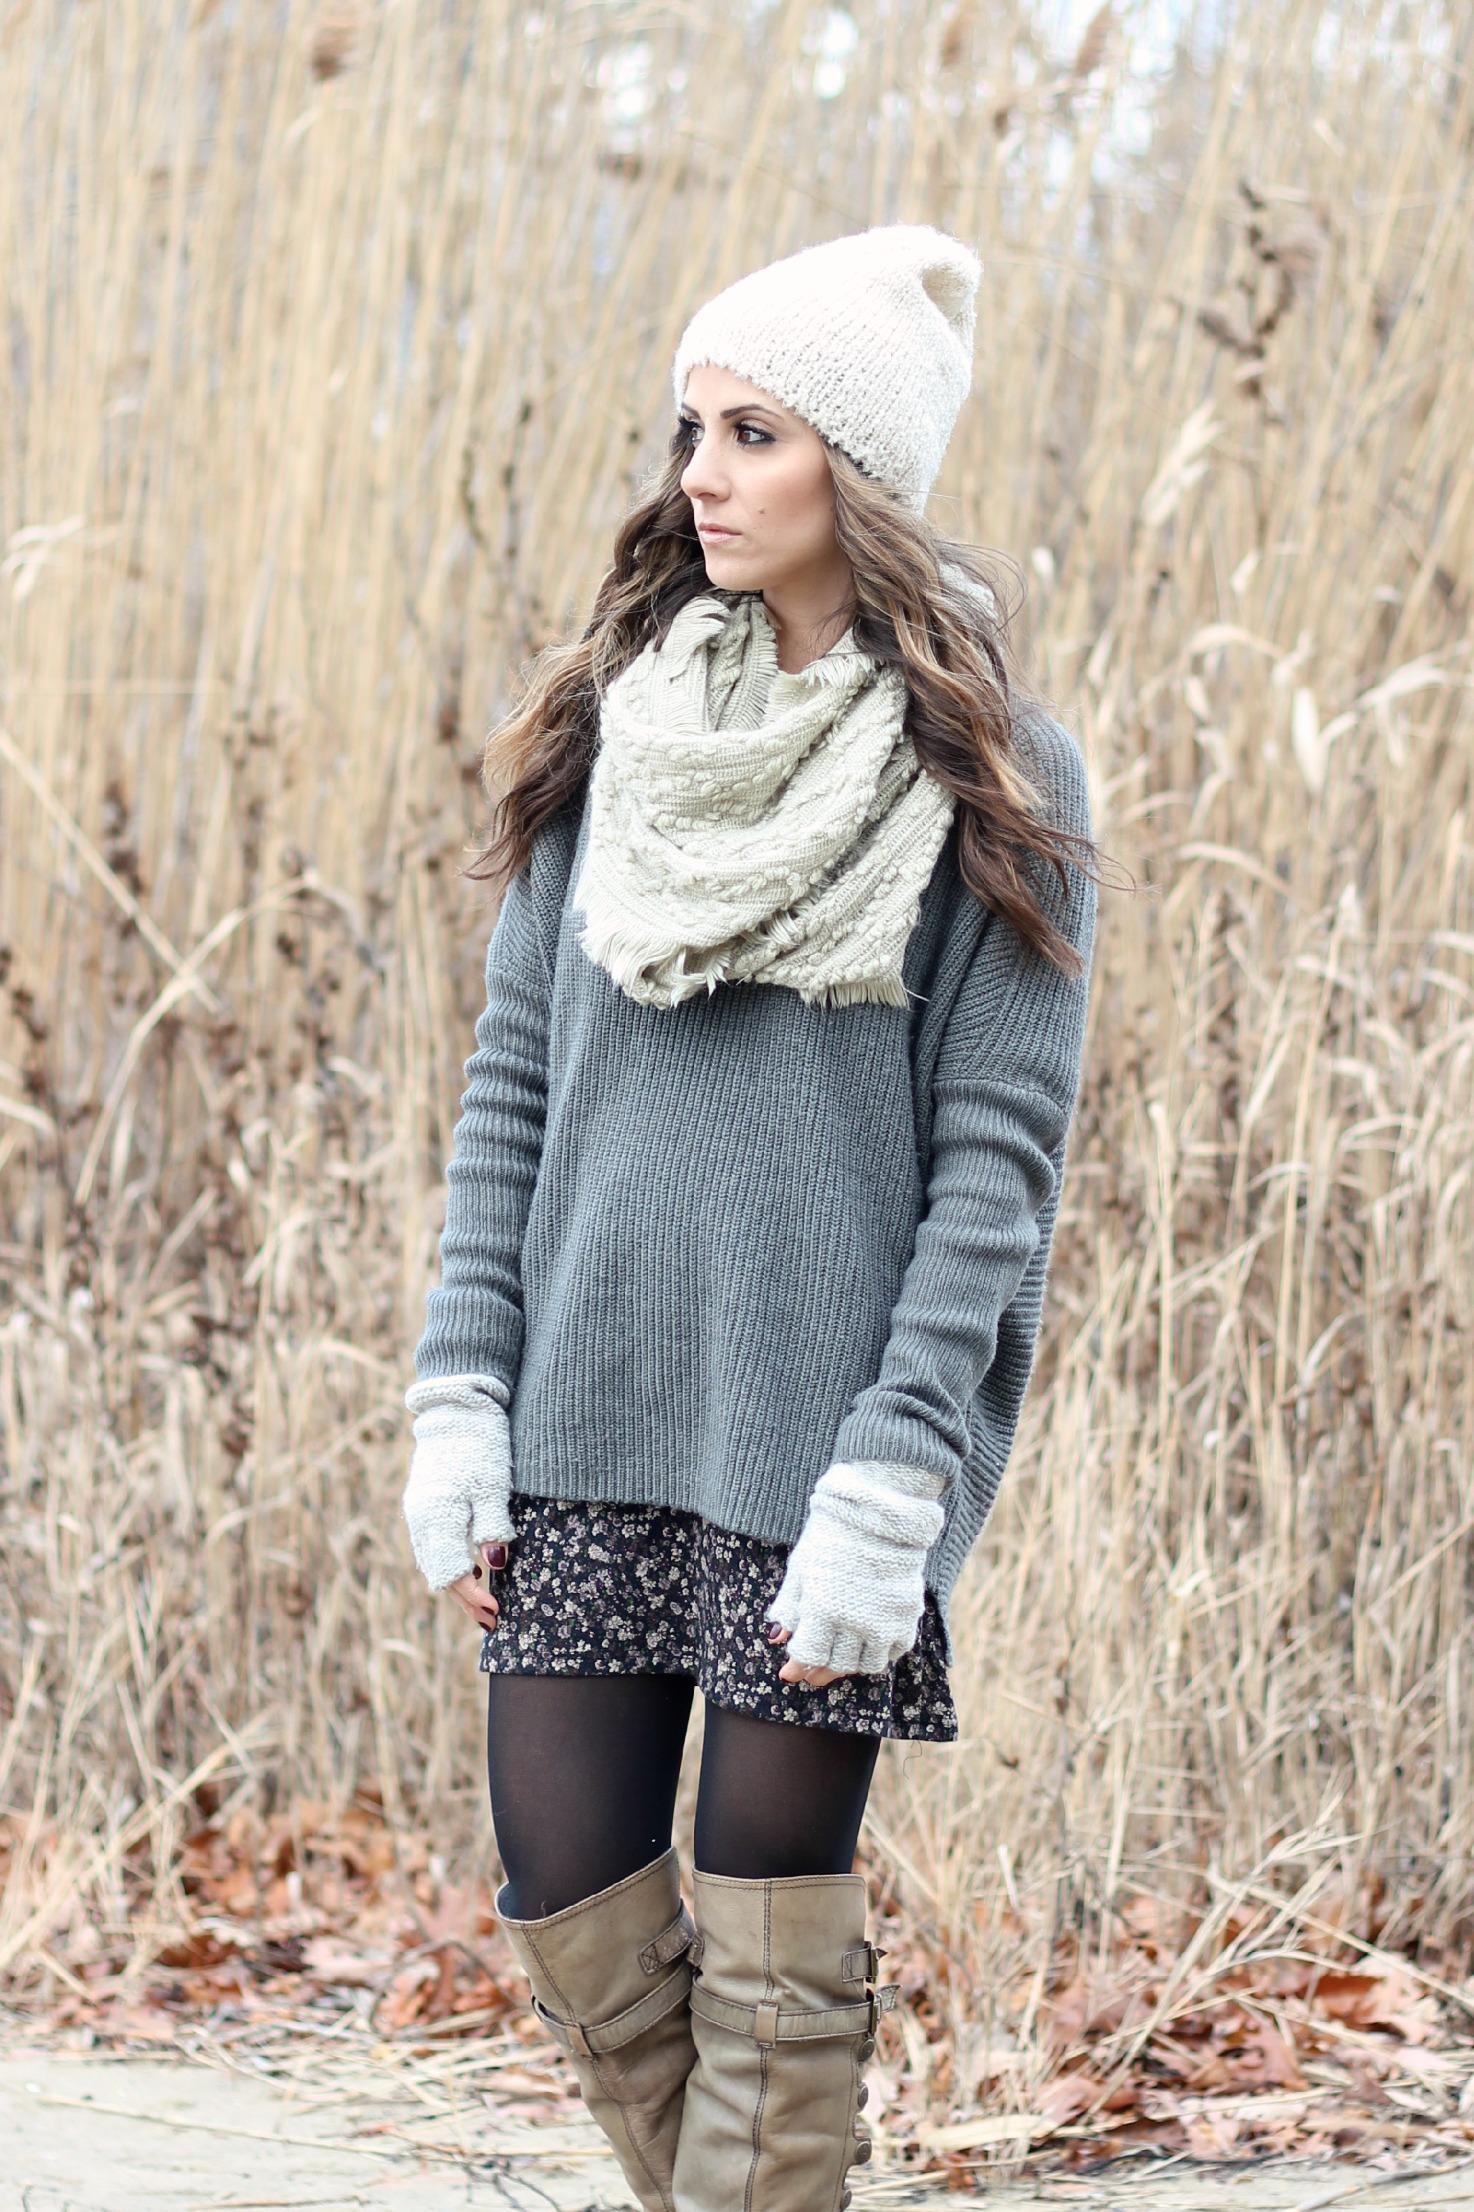 oversized sweater fashion trend, floral dress, cozy knits, winter boho style, Sam Edelman Pierce boot